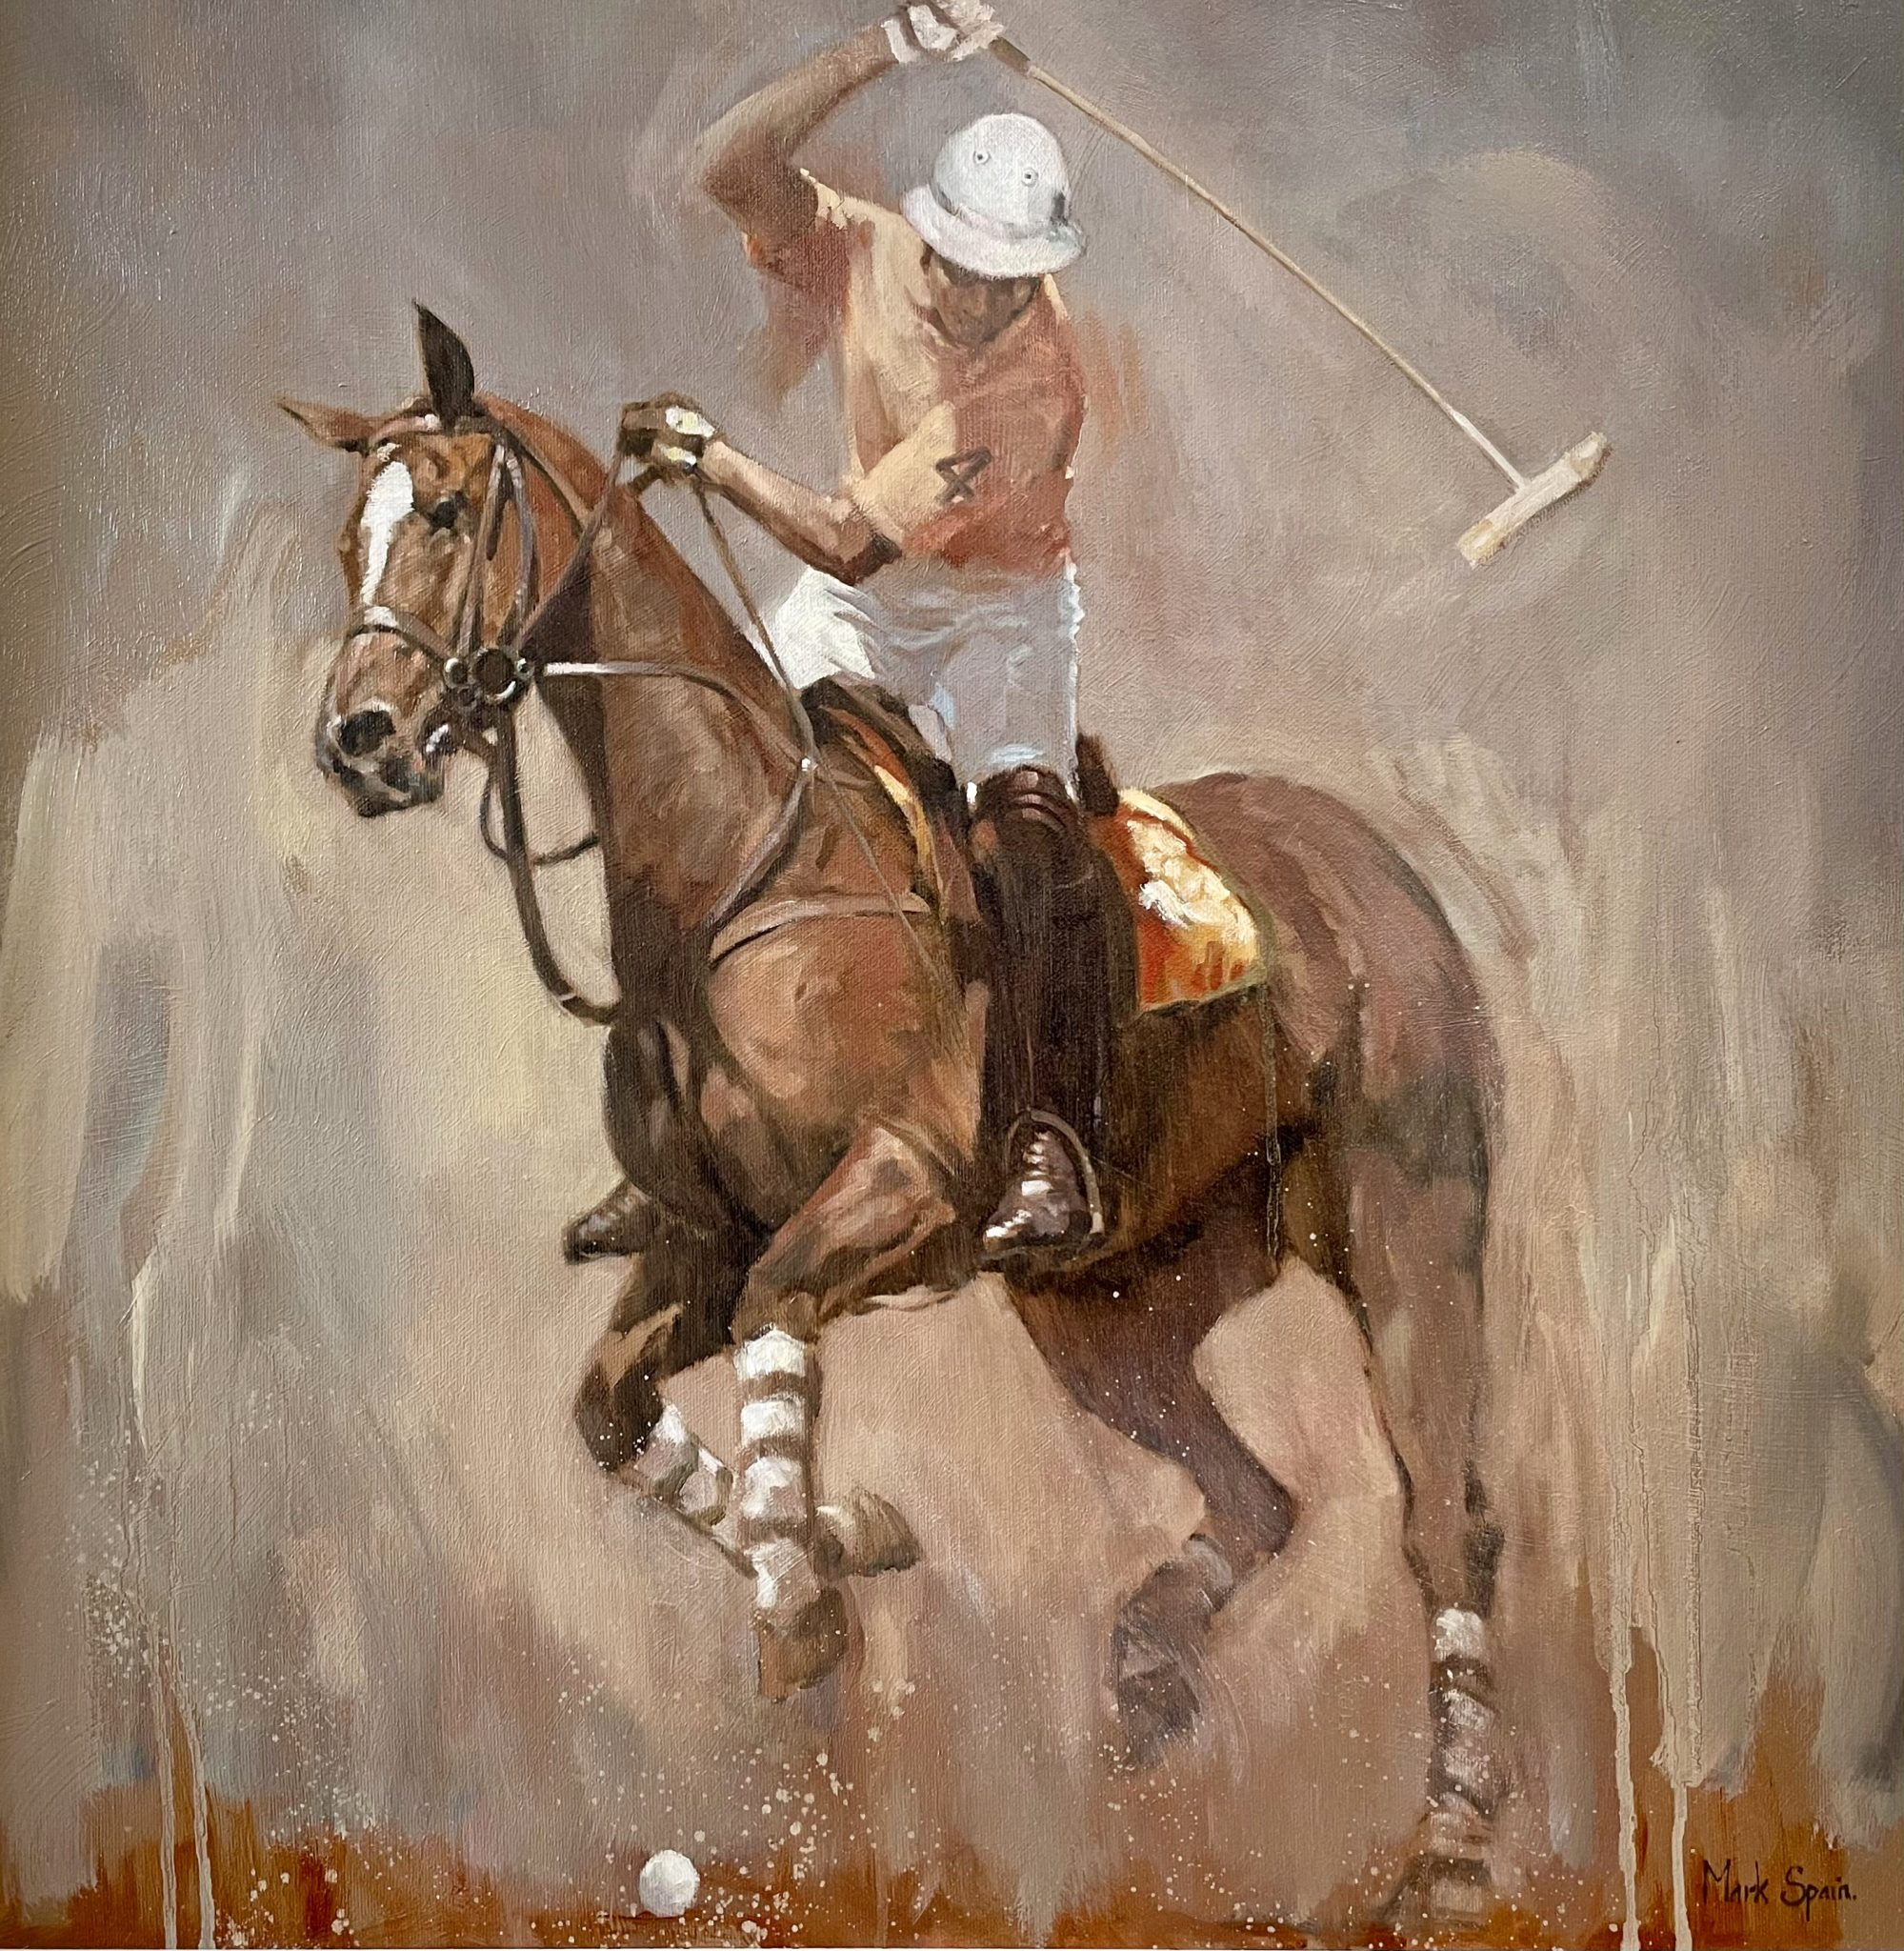 Mark Spain - Carnes Fine Art